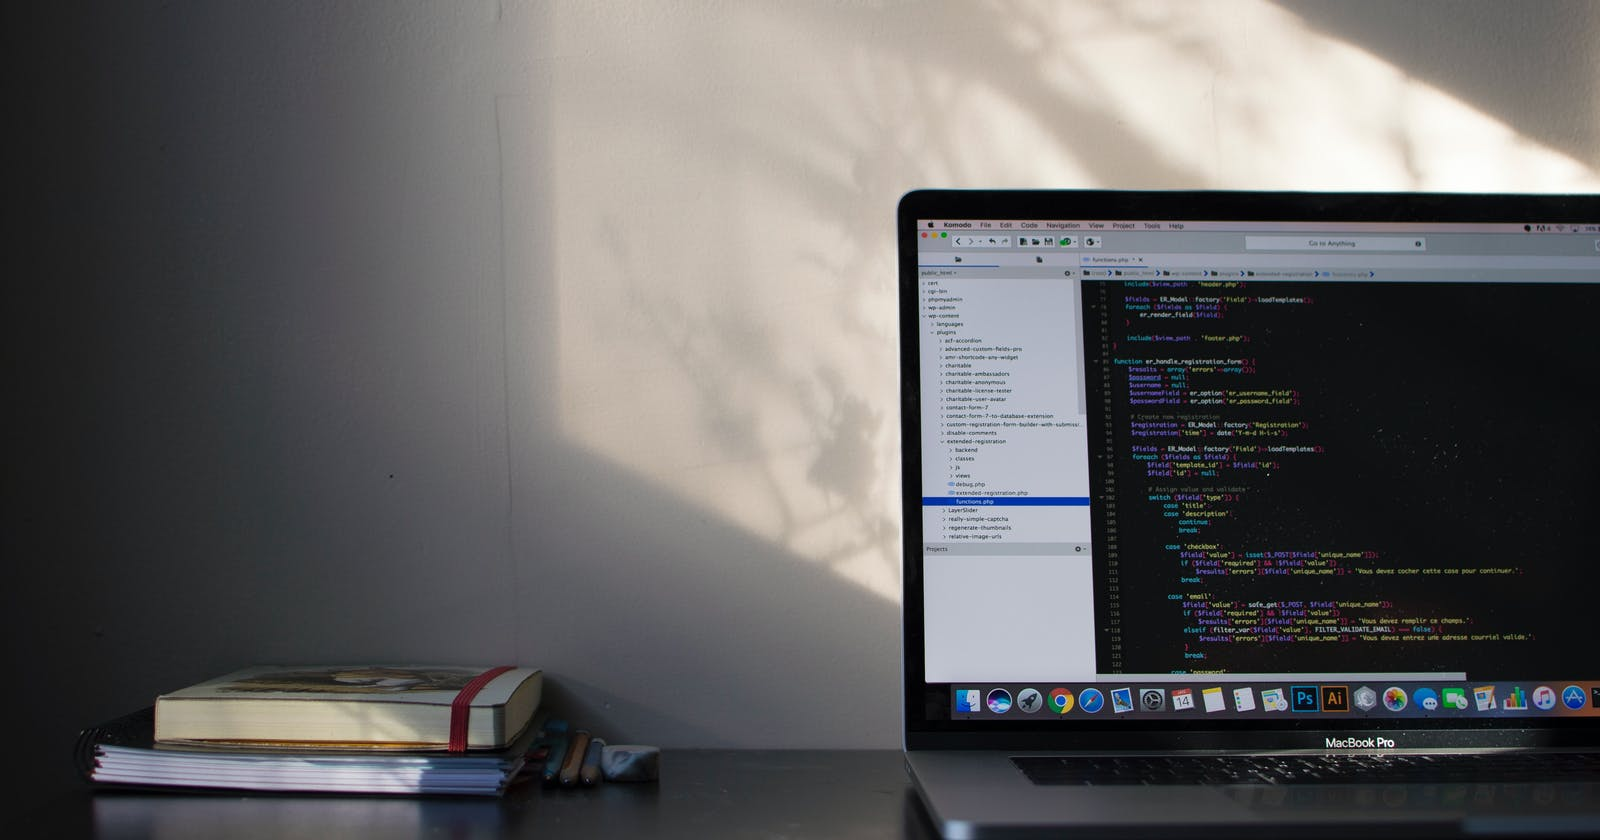 Web Development: Build your Portfolio Website Design using HTML